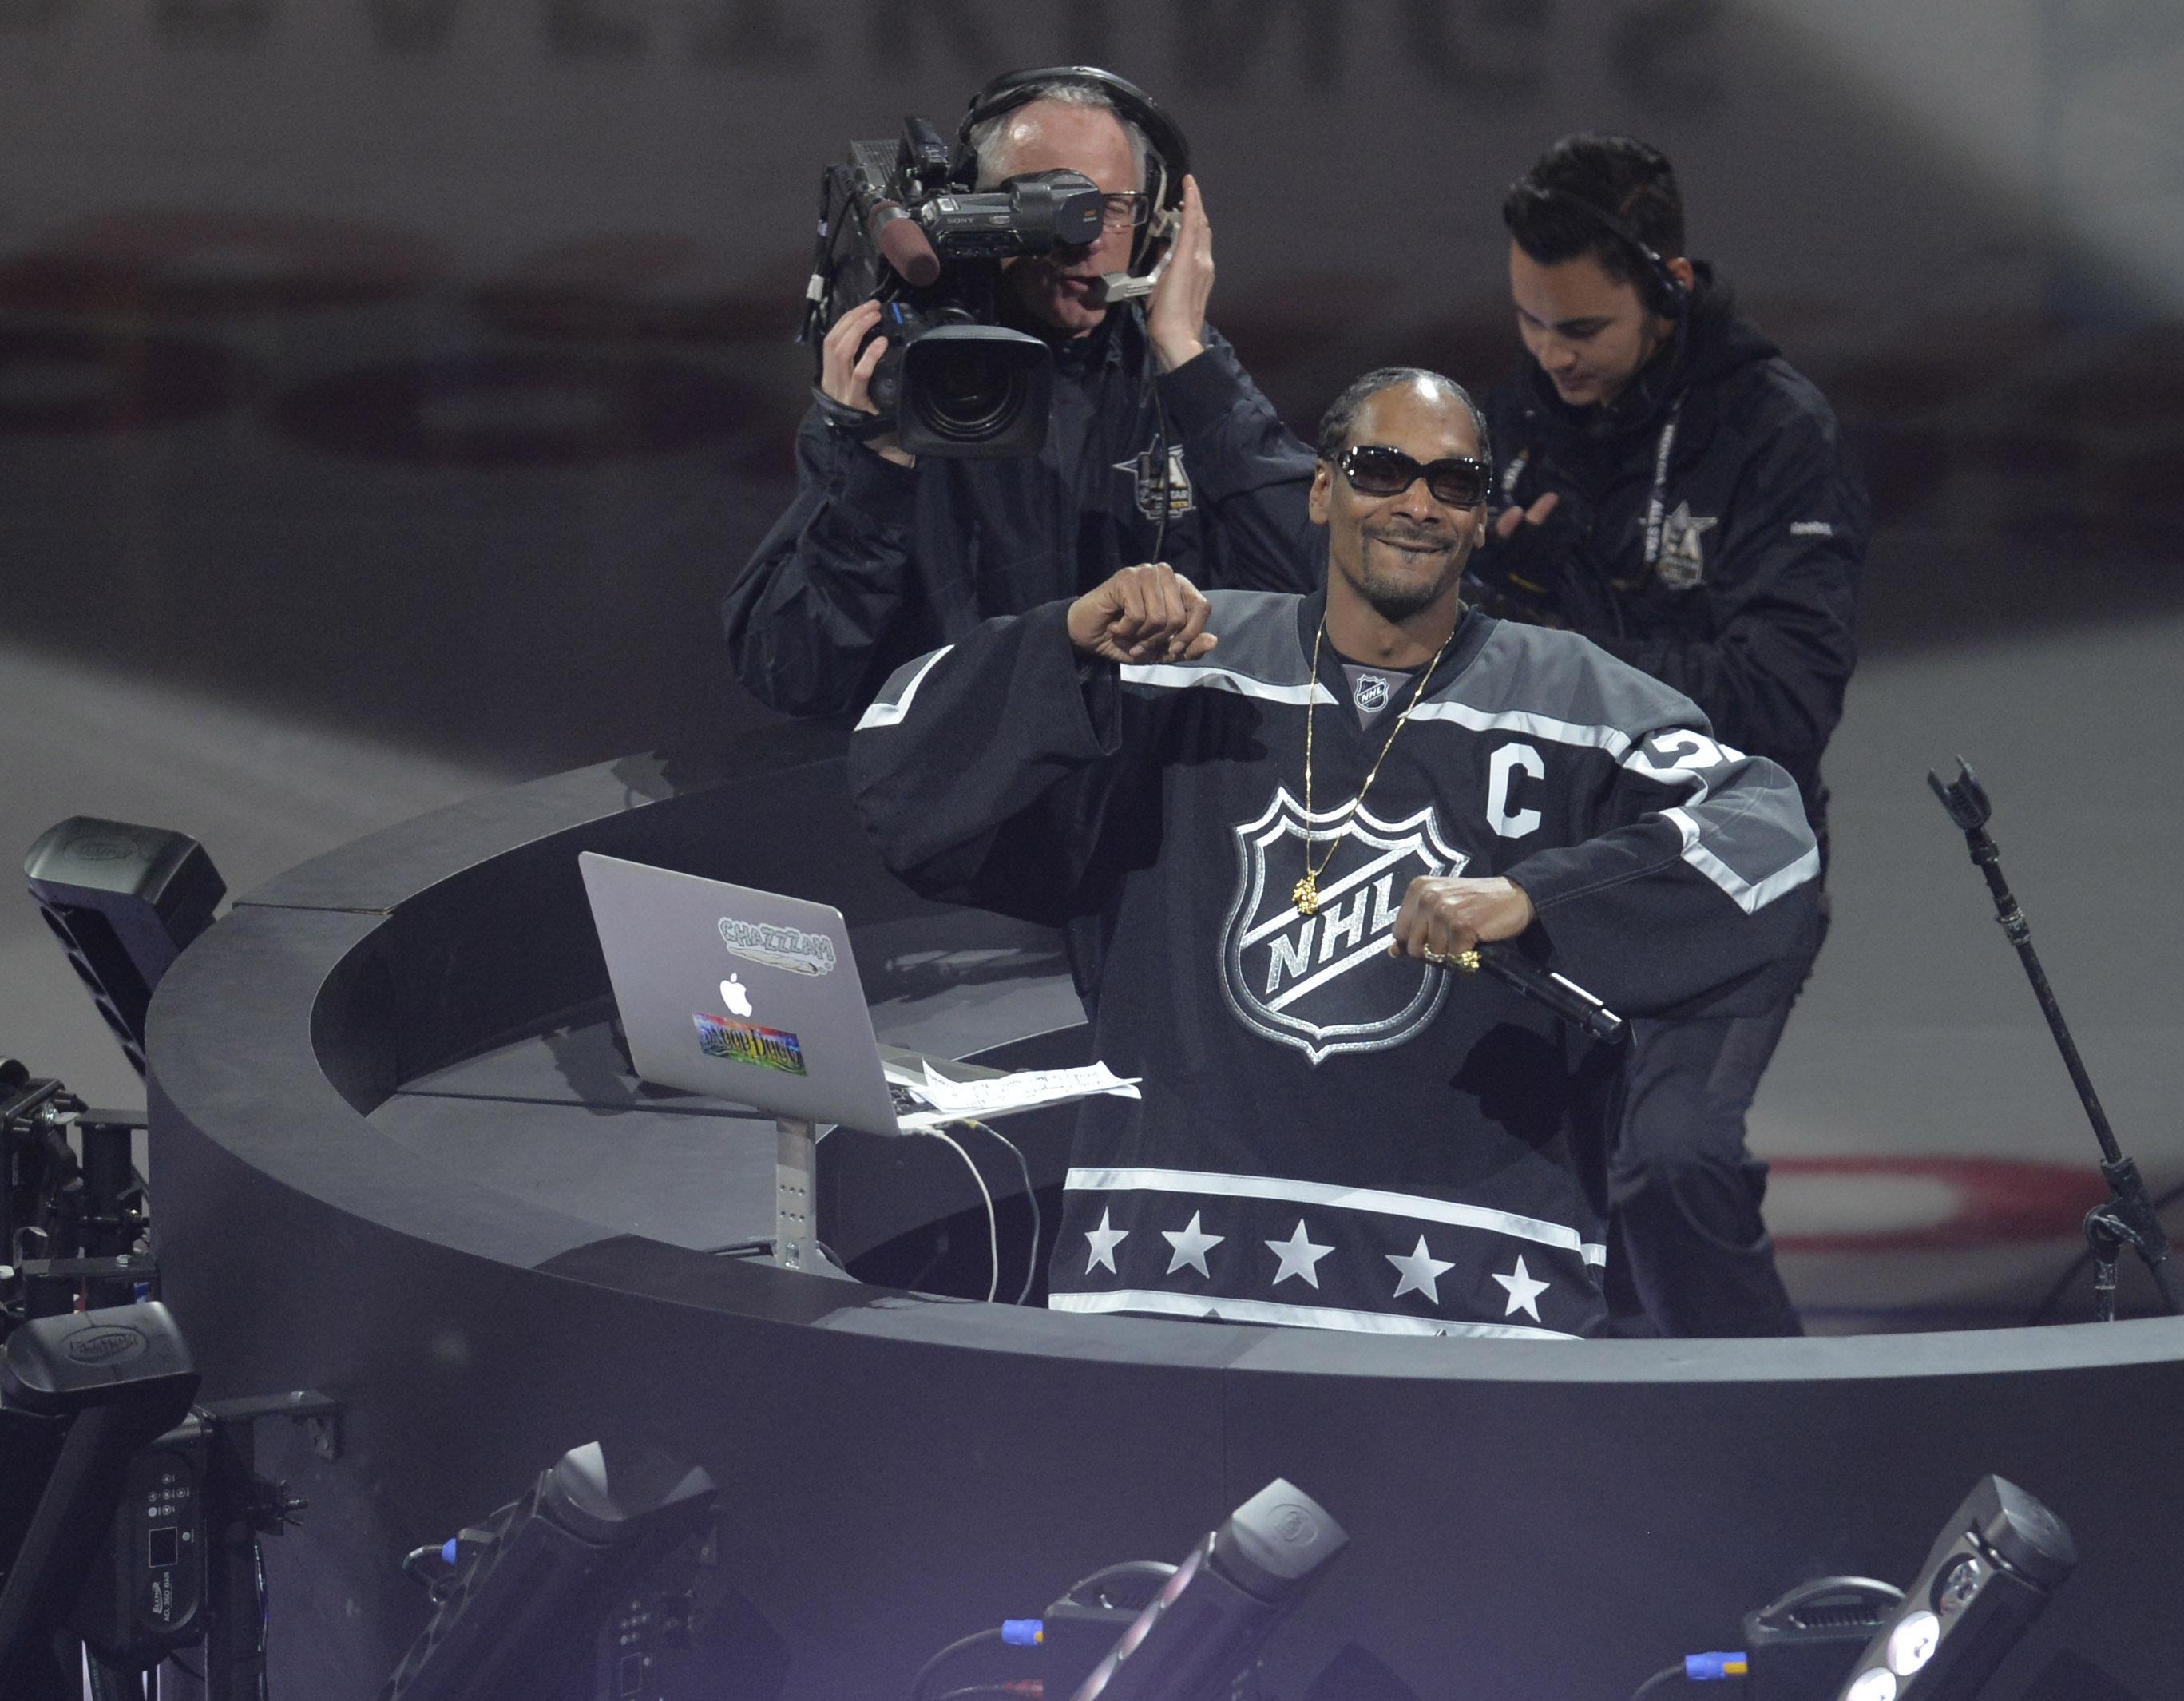 Watch: Snoop Dogg  LA Kings Play-By-Play Nephew